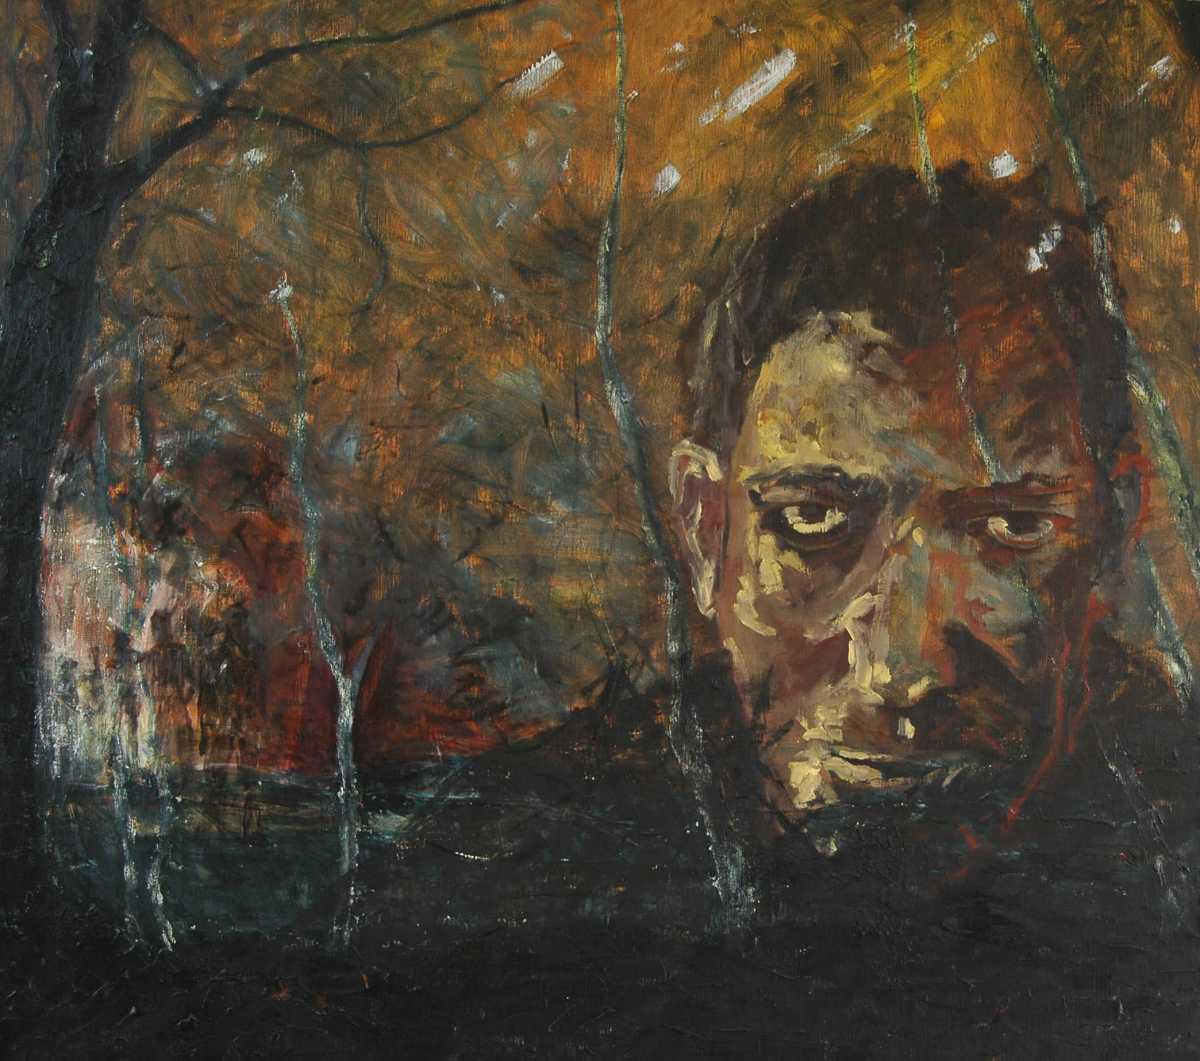 Olieverfschilderij Tussen licht en duister